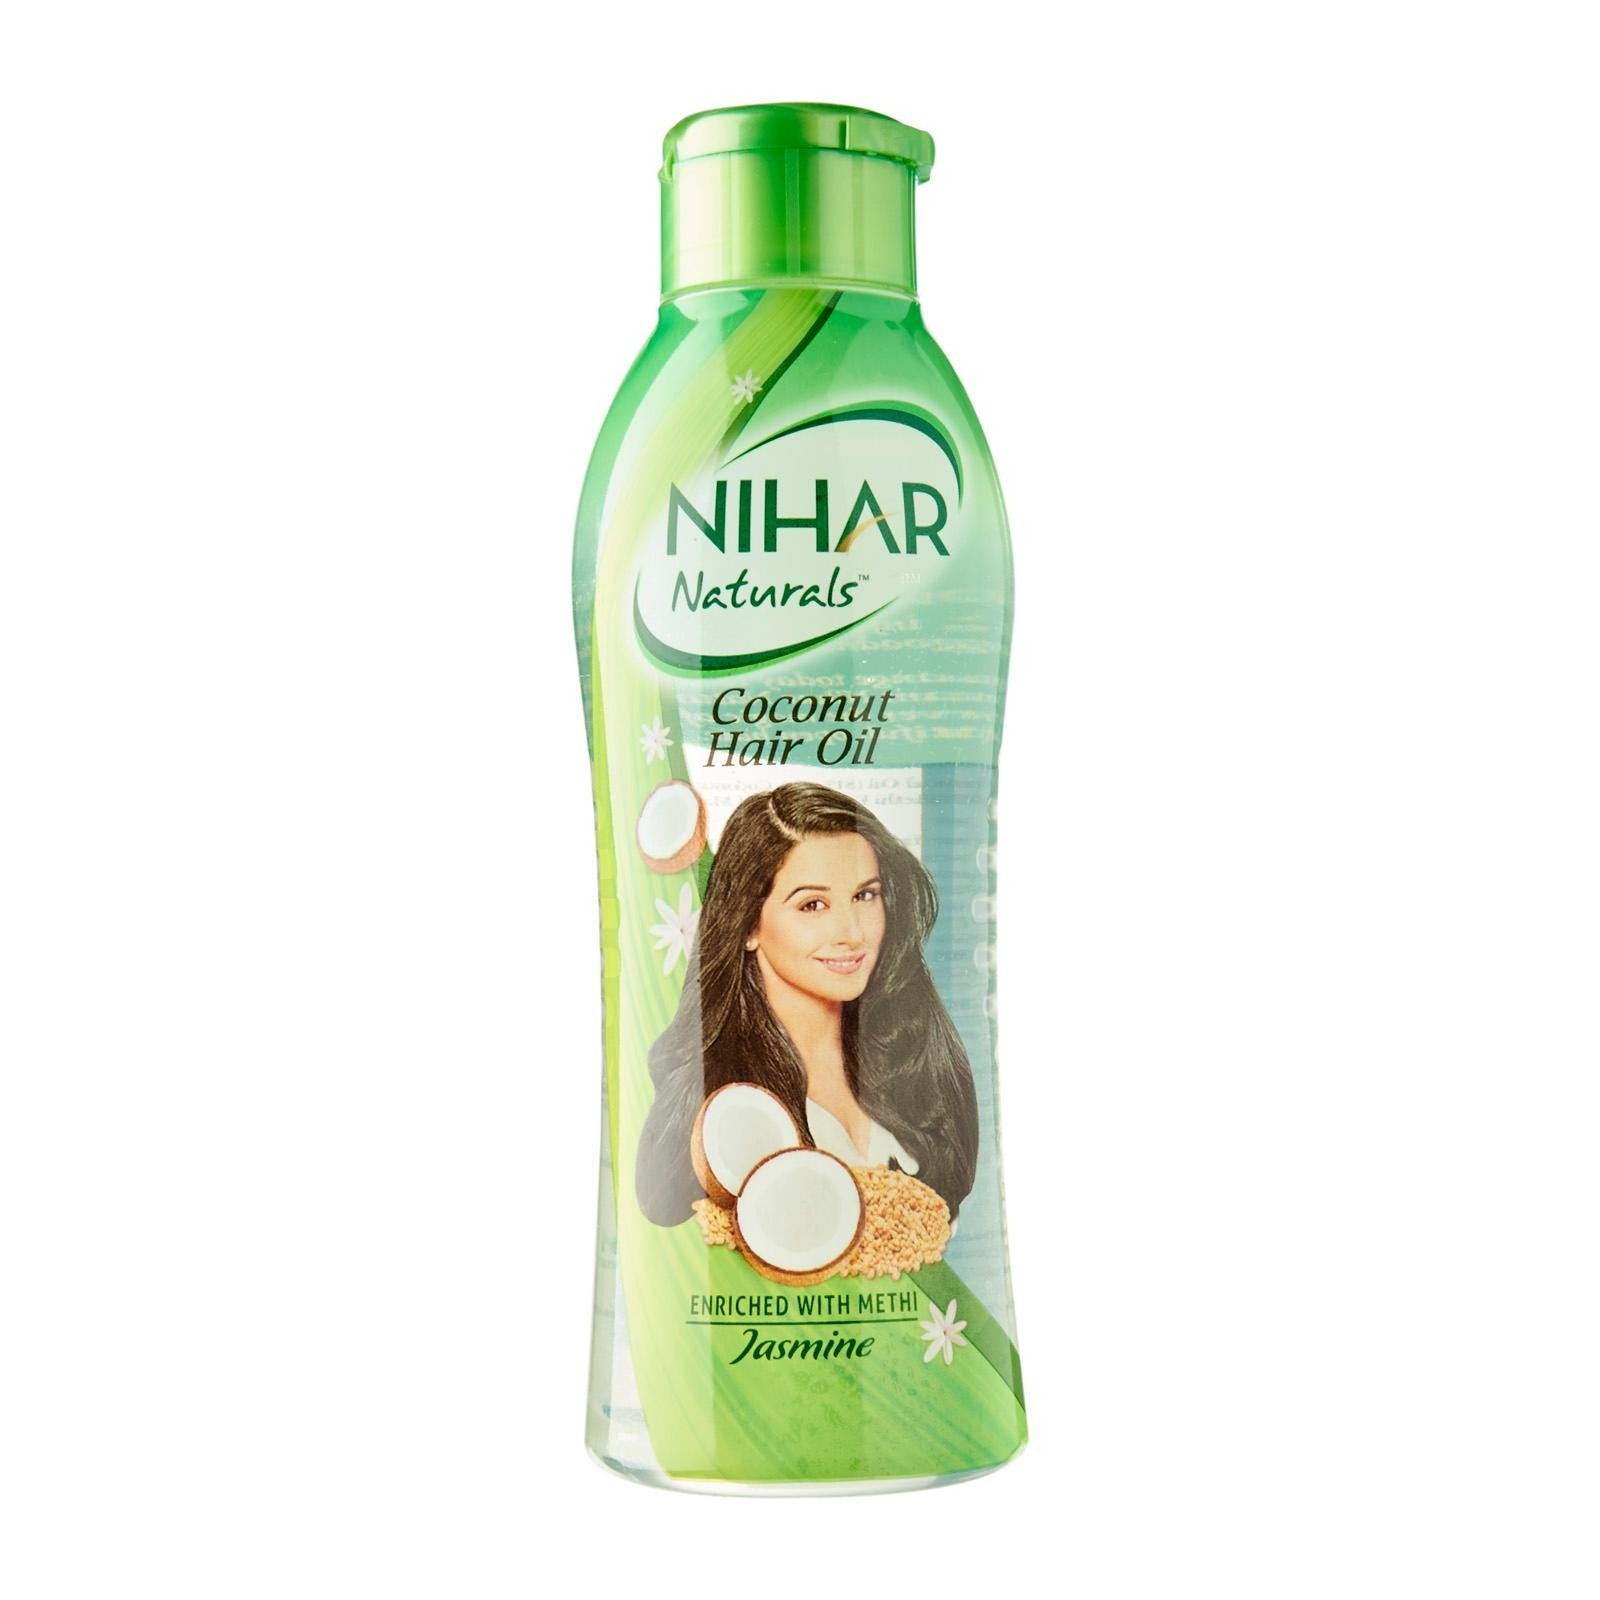 Nihar Naturals Jasmine Hair Oil